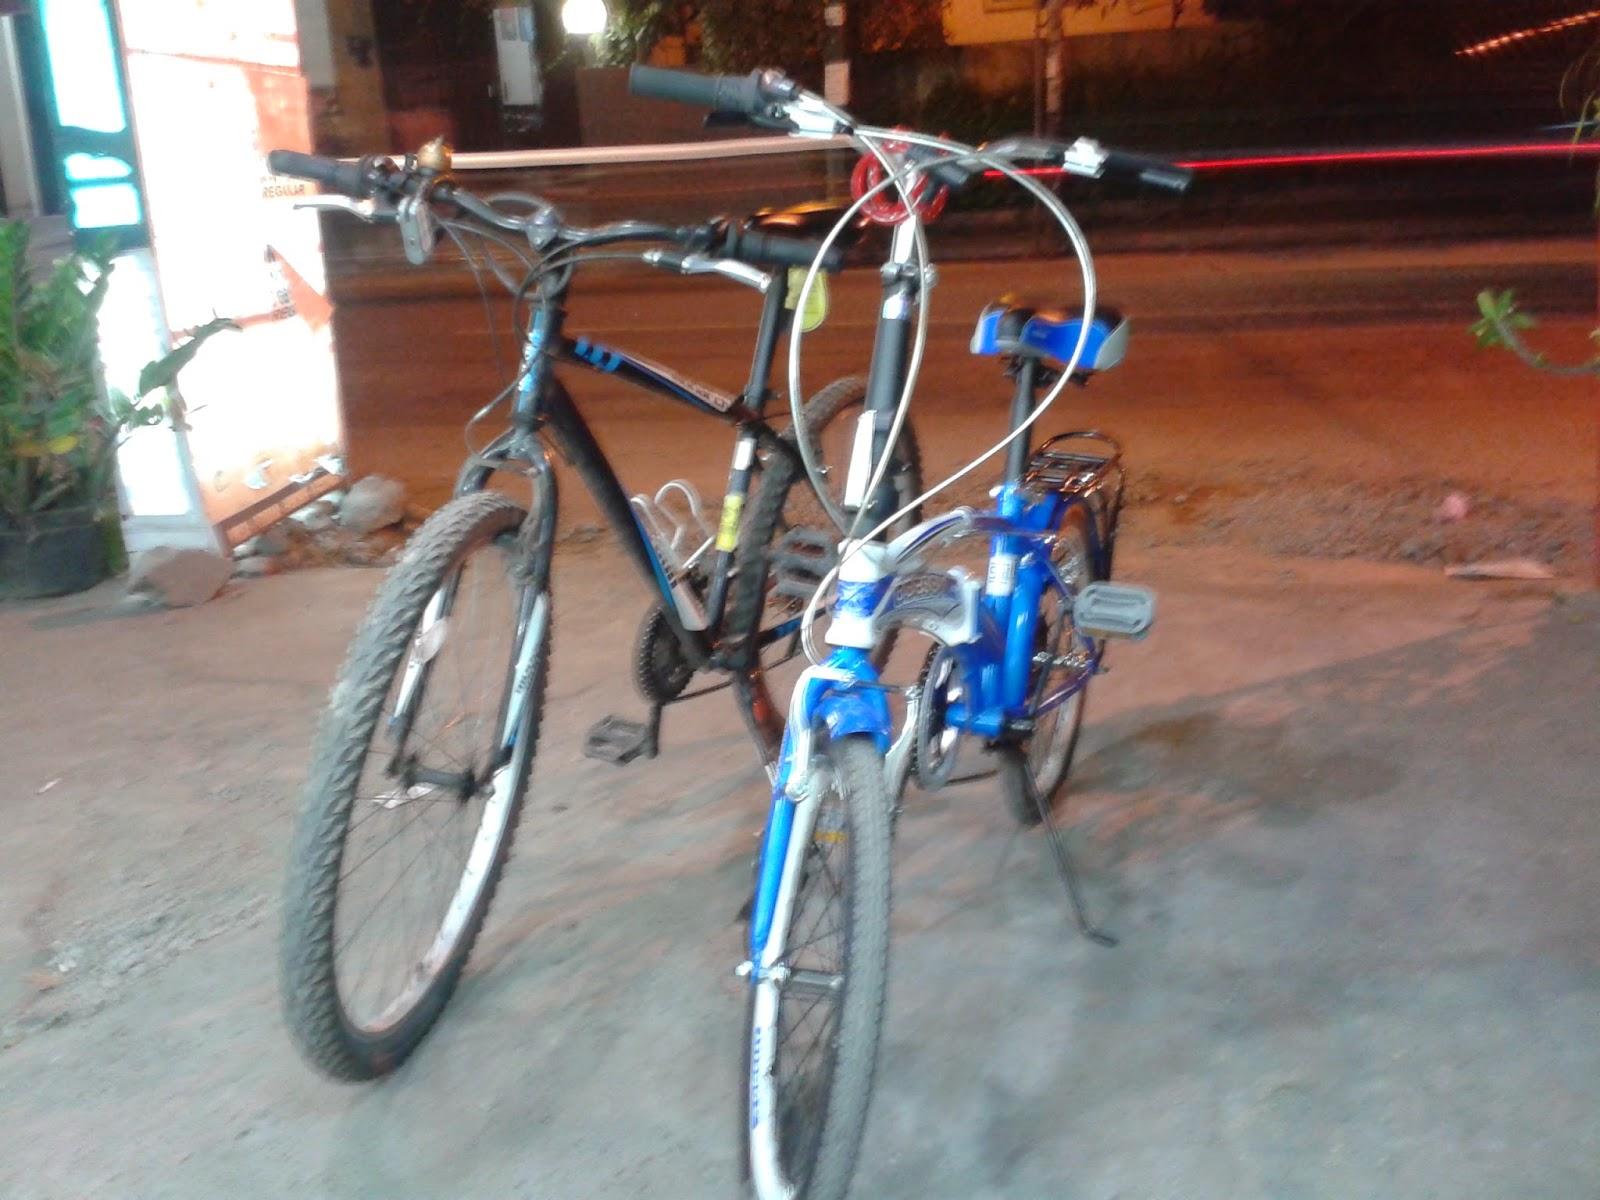 Kembali berjejeran Monarch 1 & Sepeda Lipat Odssy